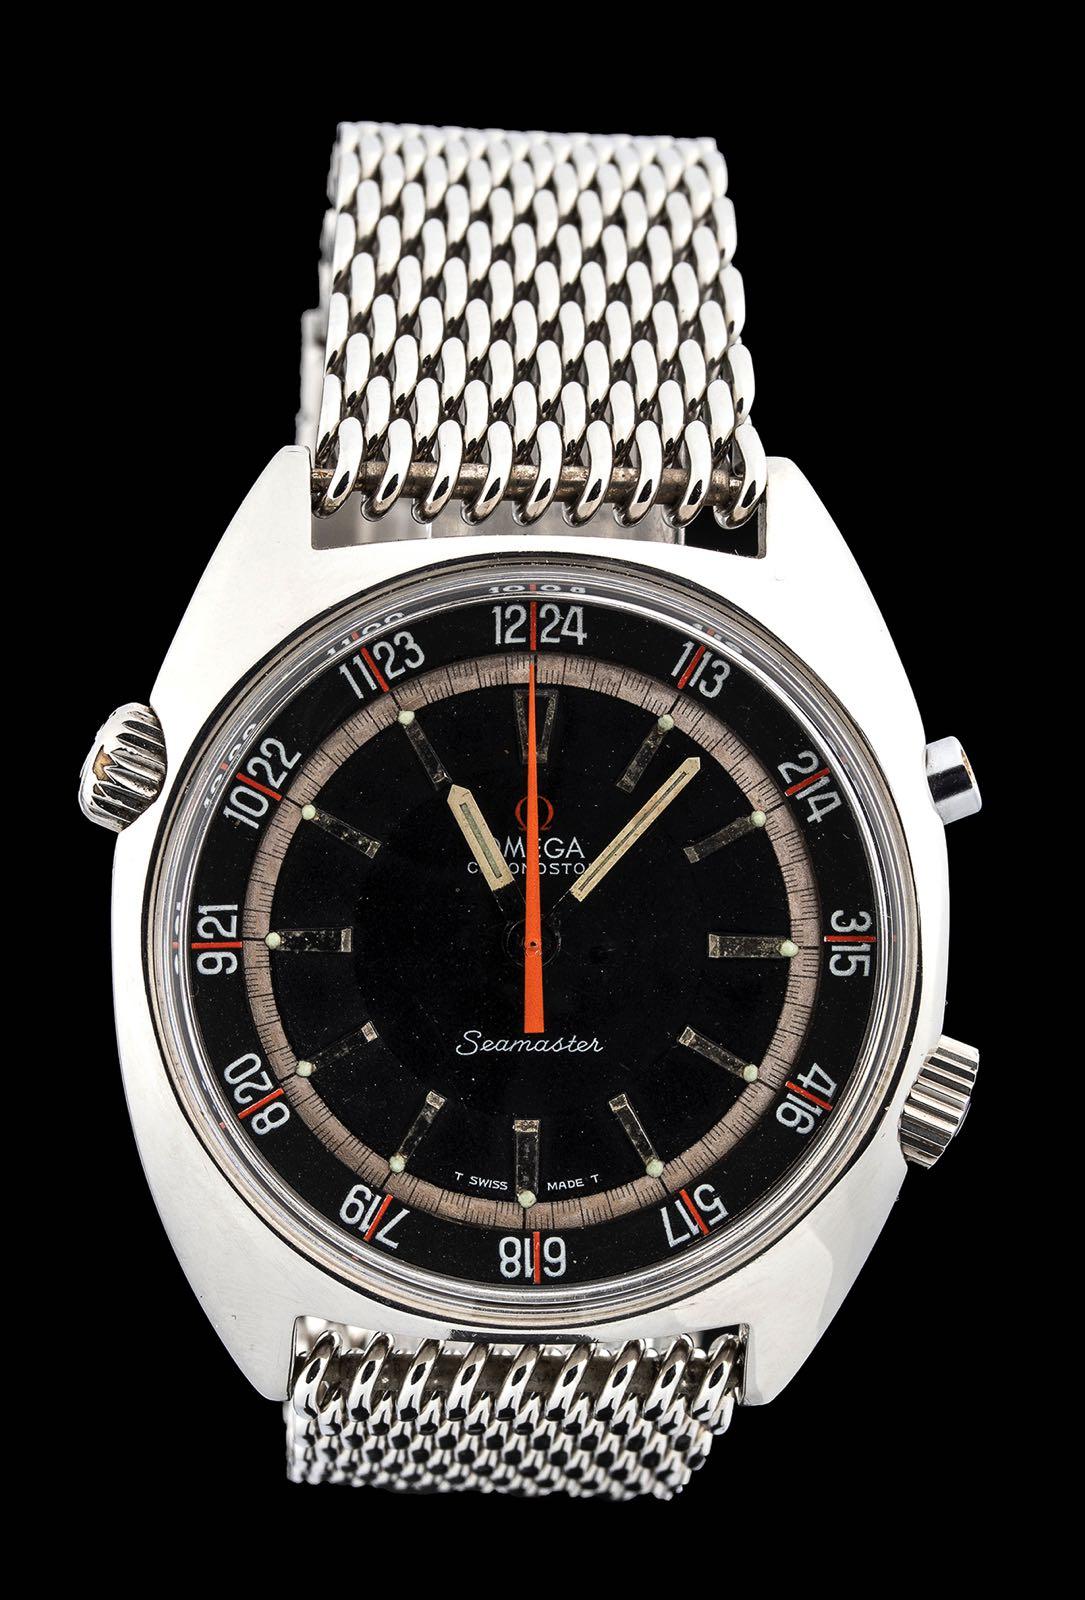 Omega SEAMASTER CHRONOSTOP Jumbo, Ref.145.008, 1969